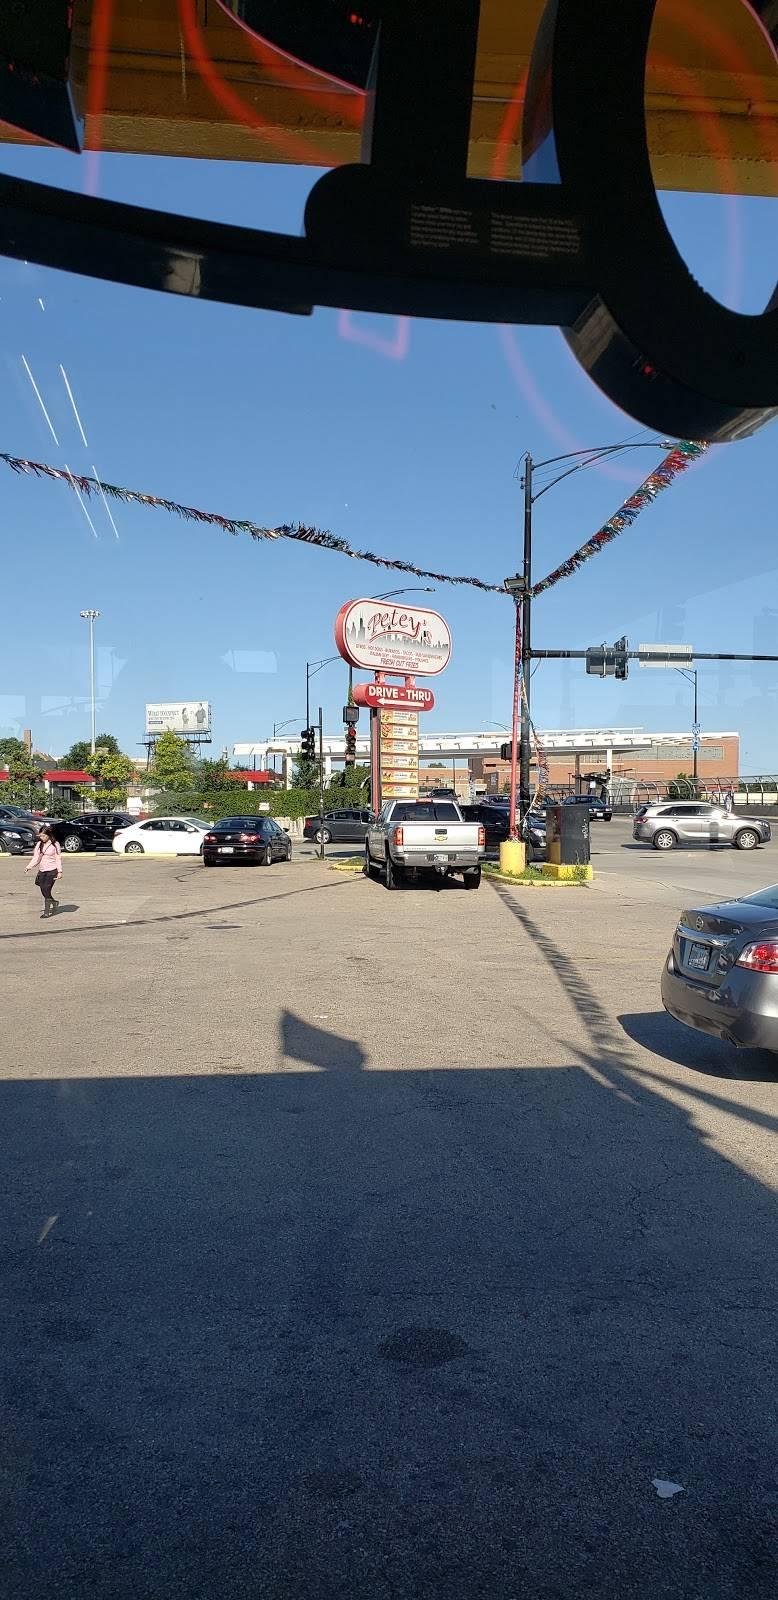 Peteys Restaurant   restaurant   250 W 47th St, Chicago, IL 60609, USA   7739666113 OR +1 773-966-6113